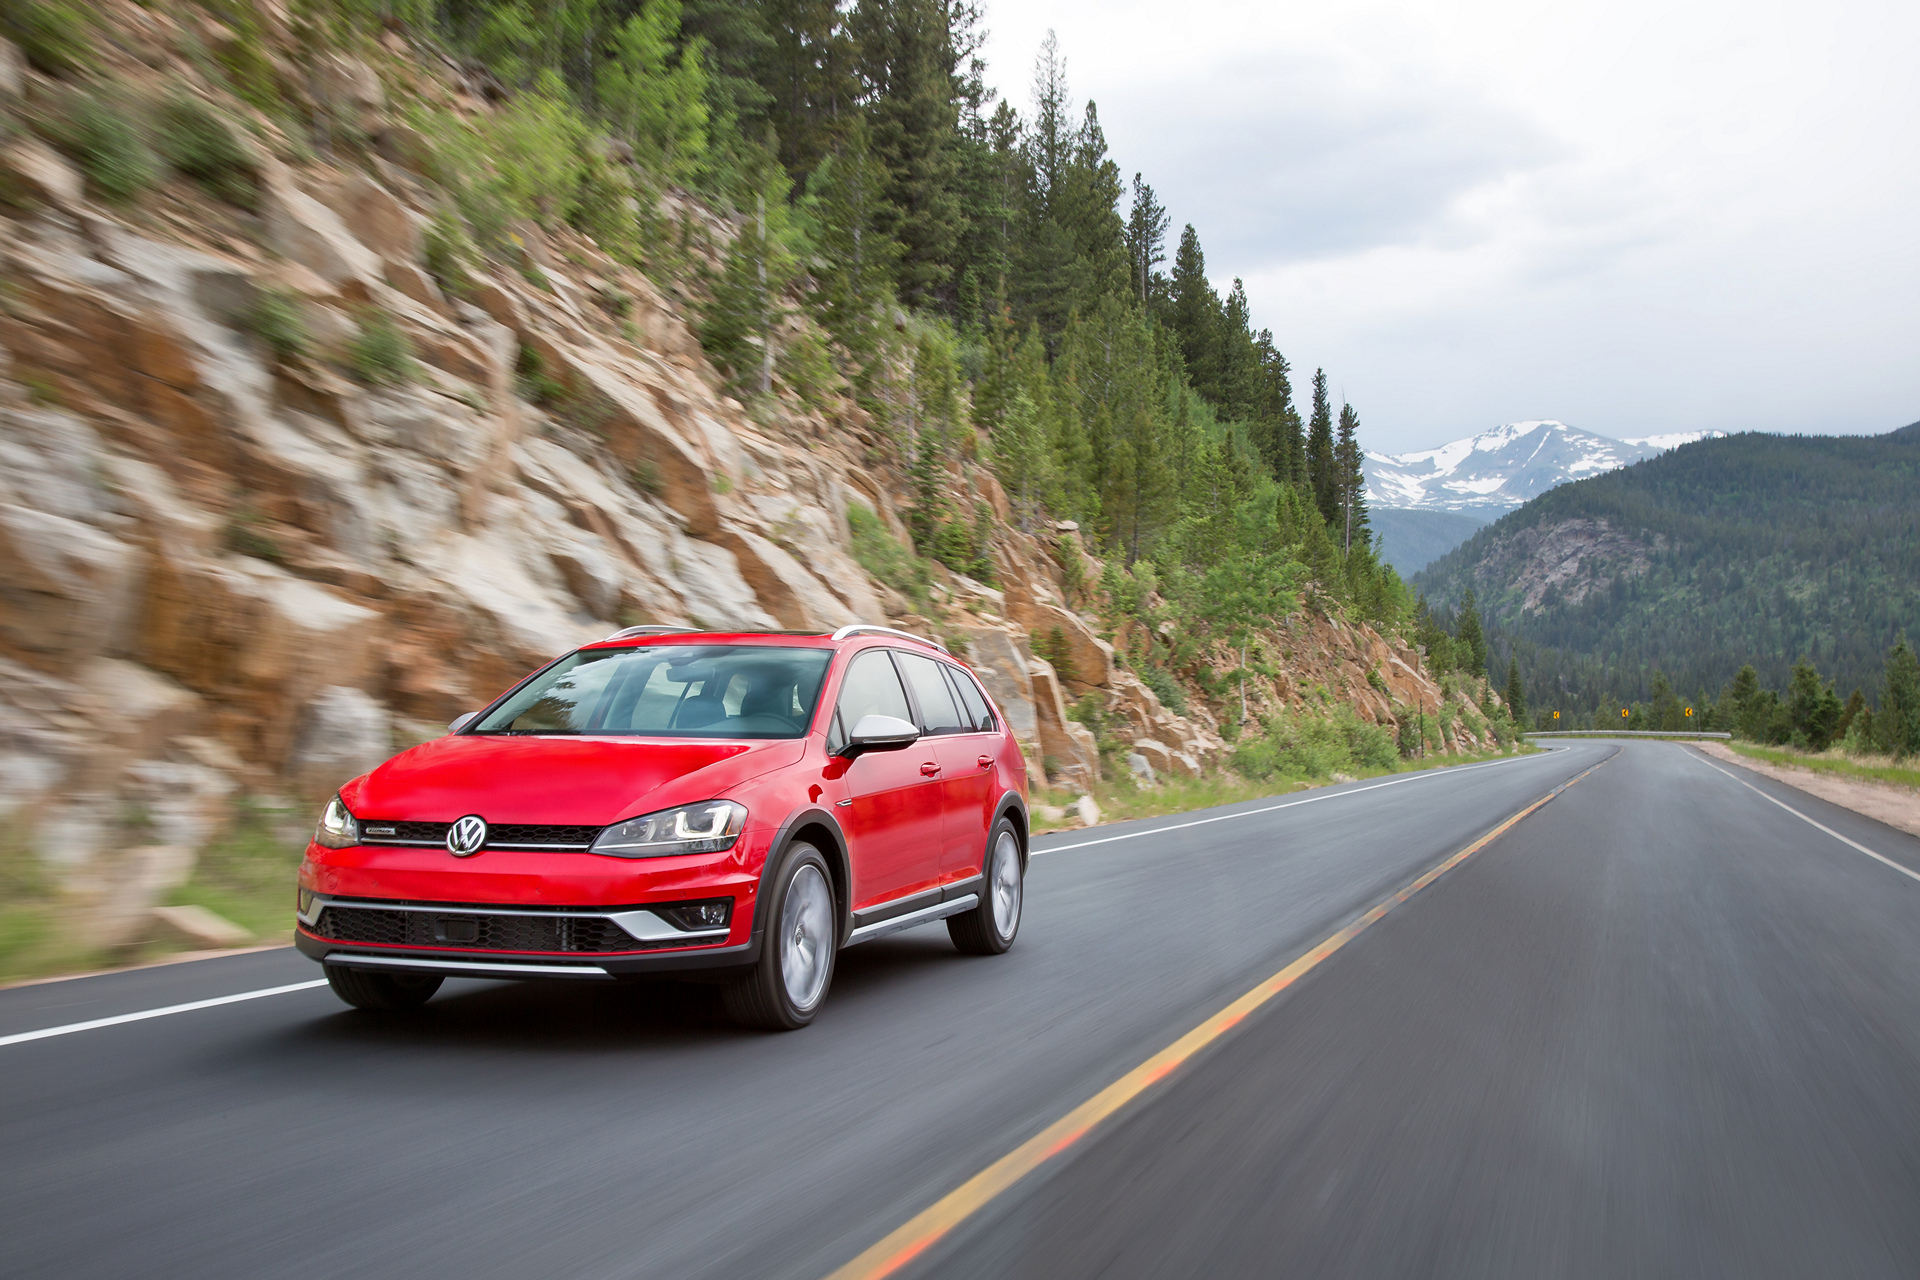 2017 Volkswagen Golf Alltrack © Volkswagen AG